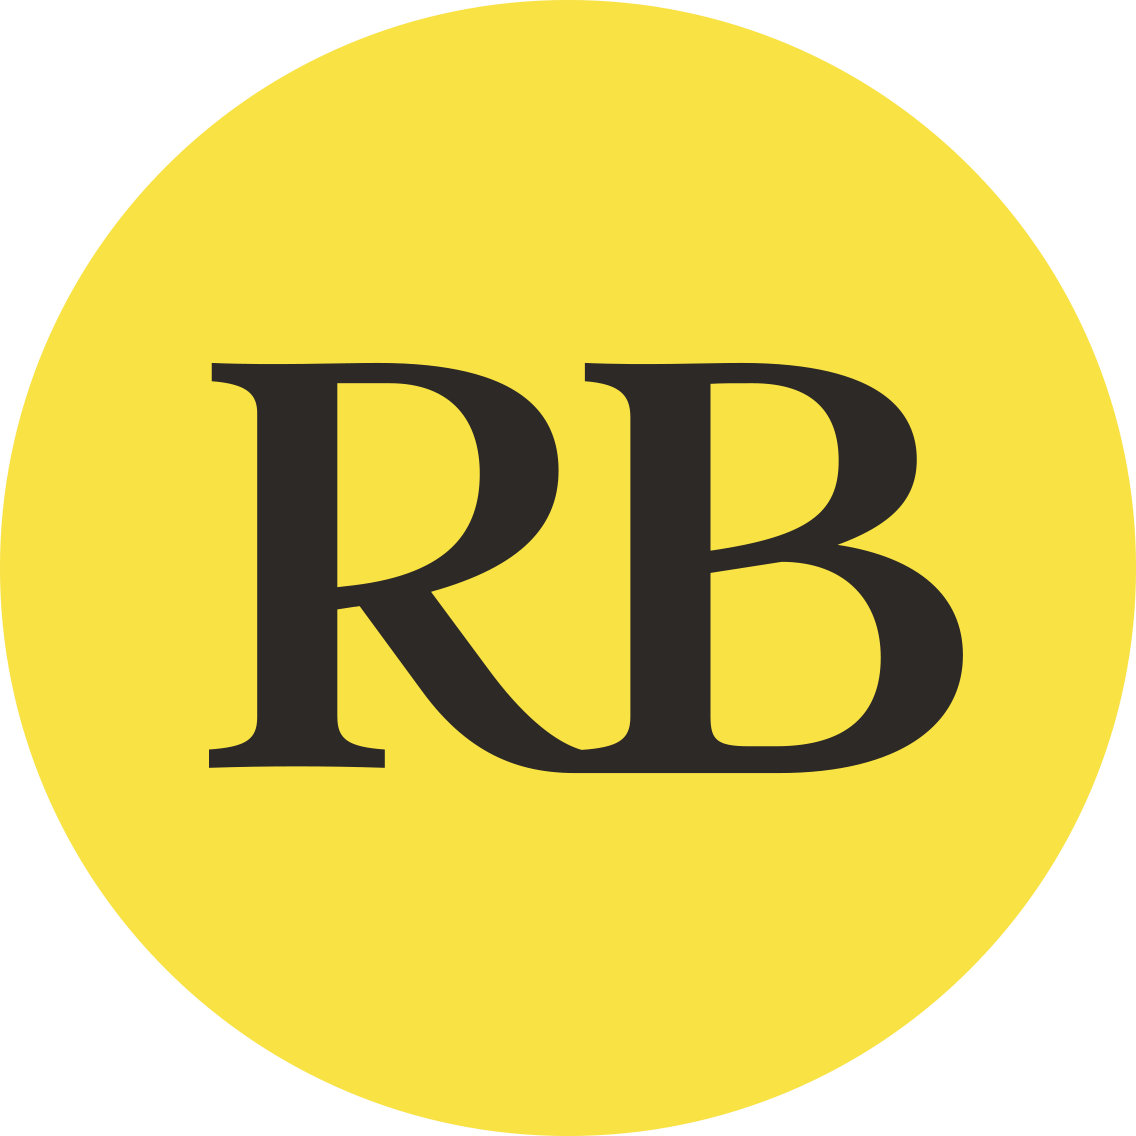 Rob Rebholz